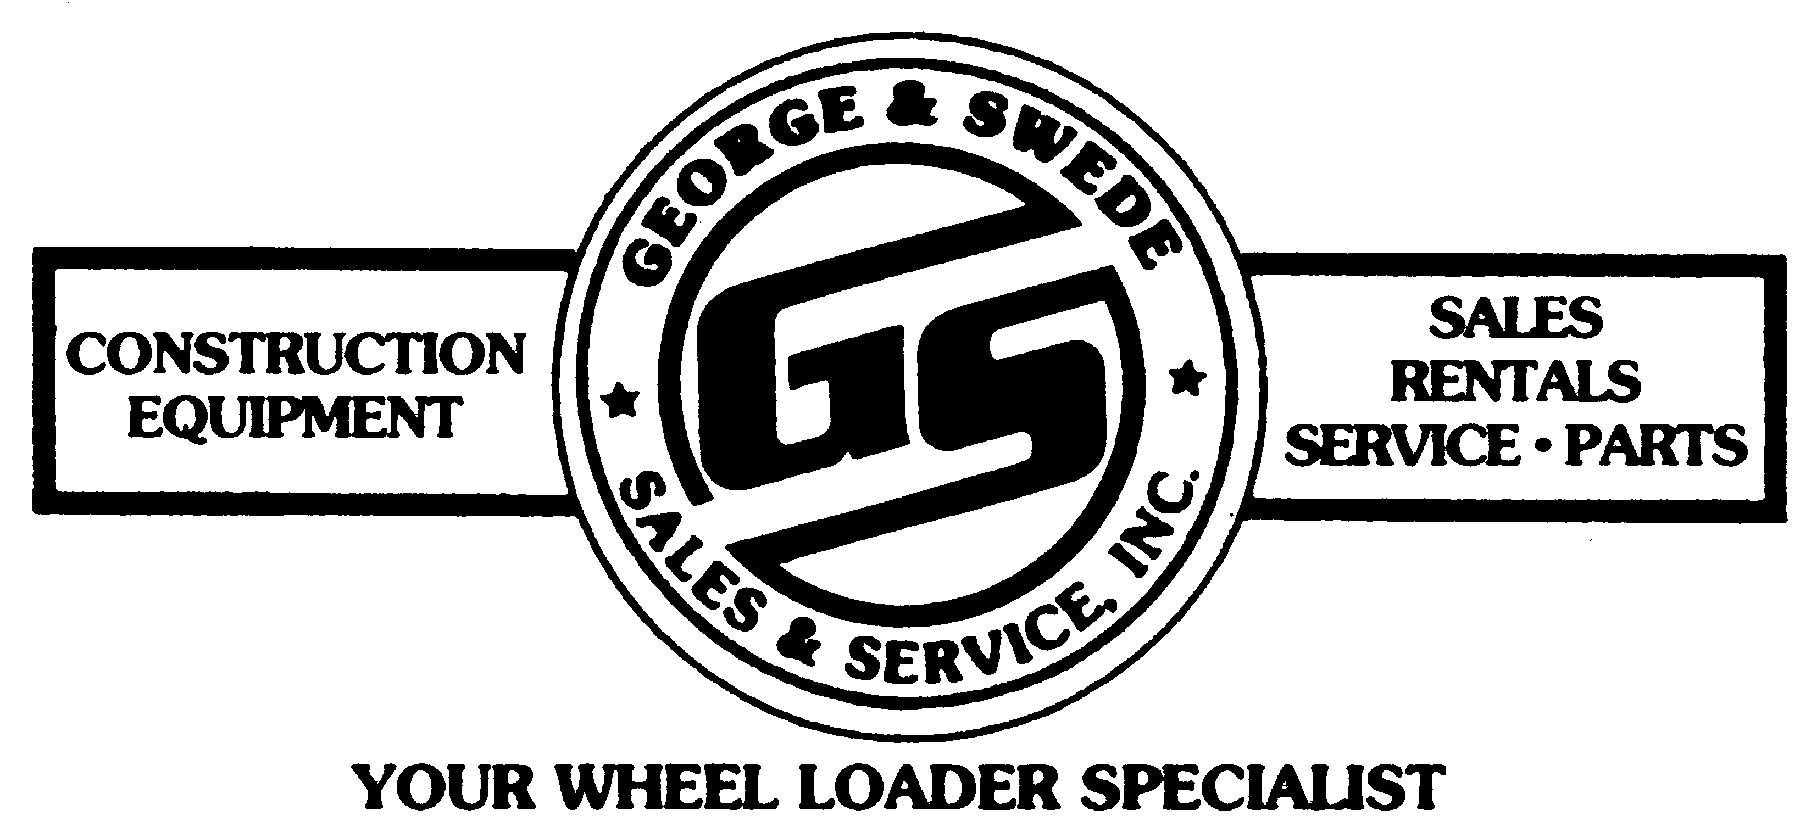 George & Swede